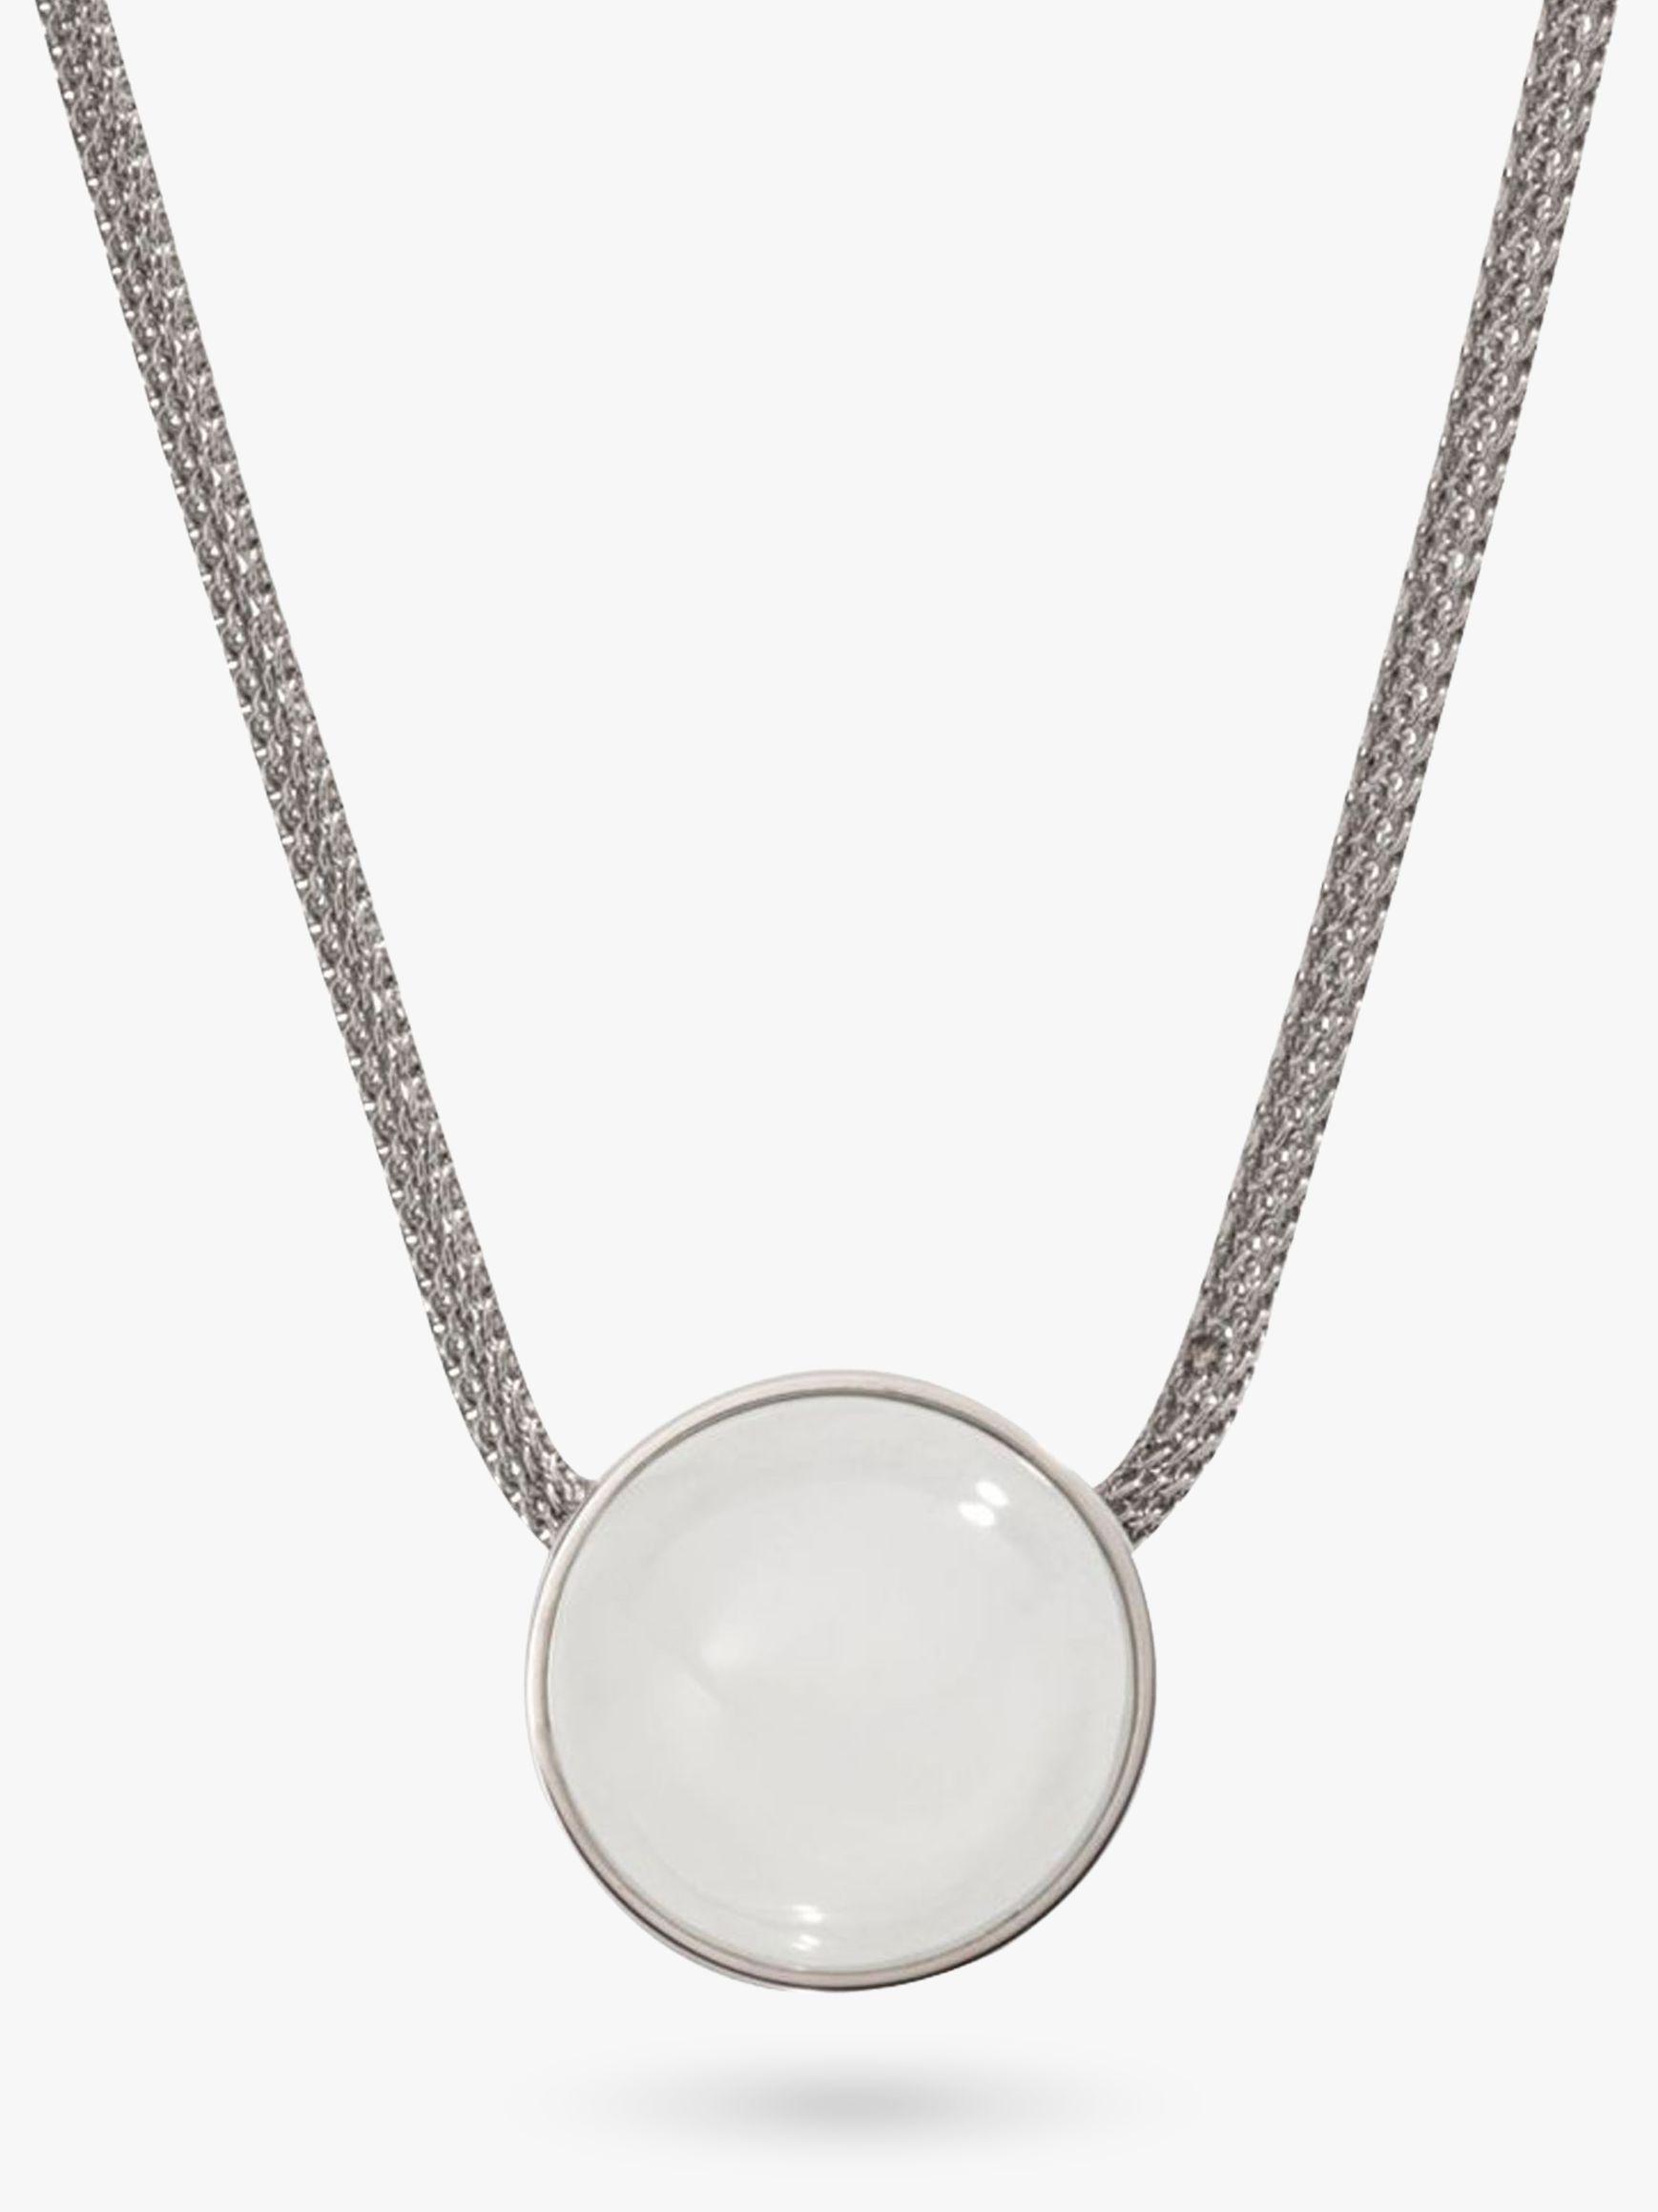 skagen Skagen Sea Glass Round Pendant Necklace, Silver/White SKJ0080040